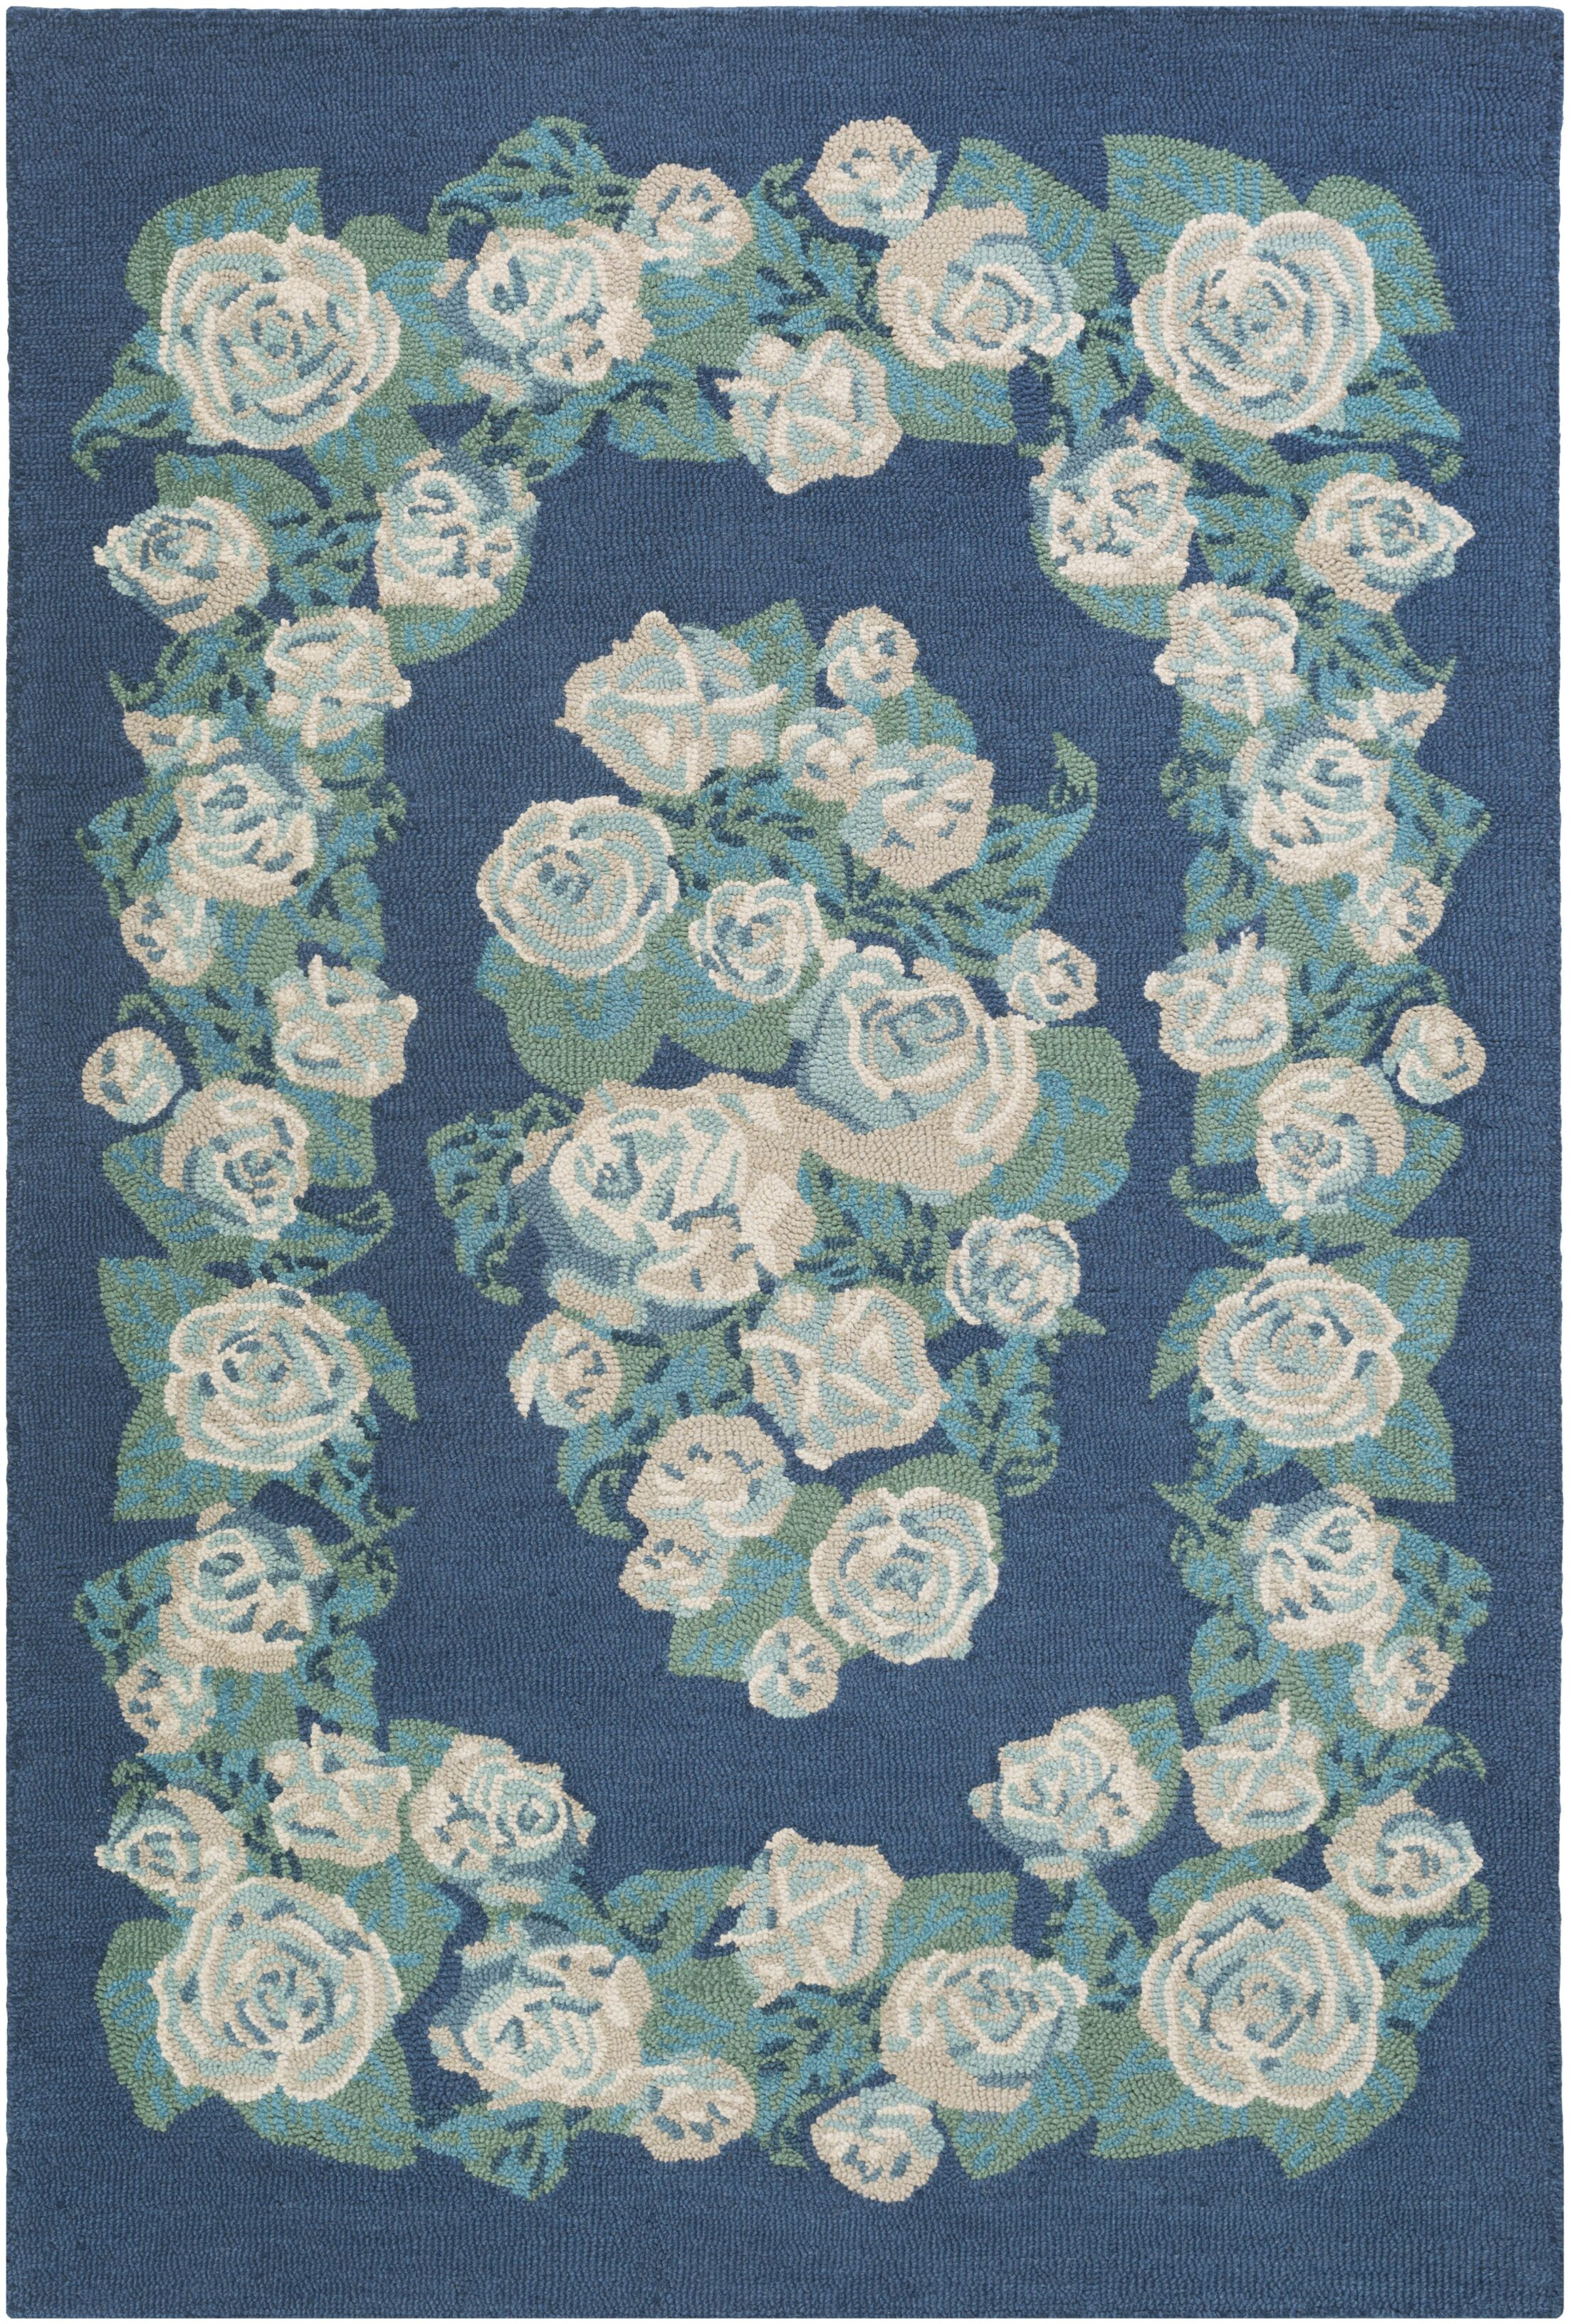 Lackey Hand-Tufted Blue Area Rug Rug Size: Rectangle 8' x 10'